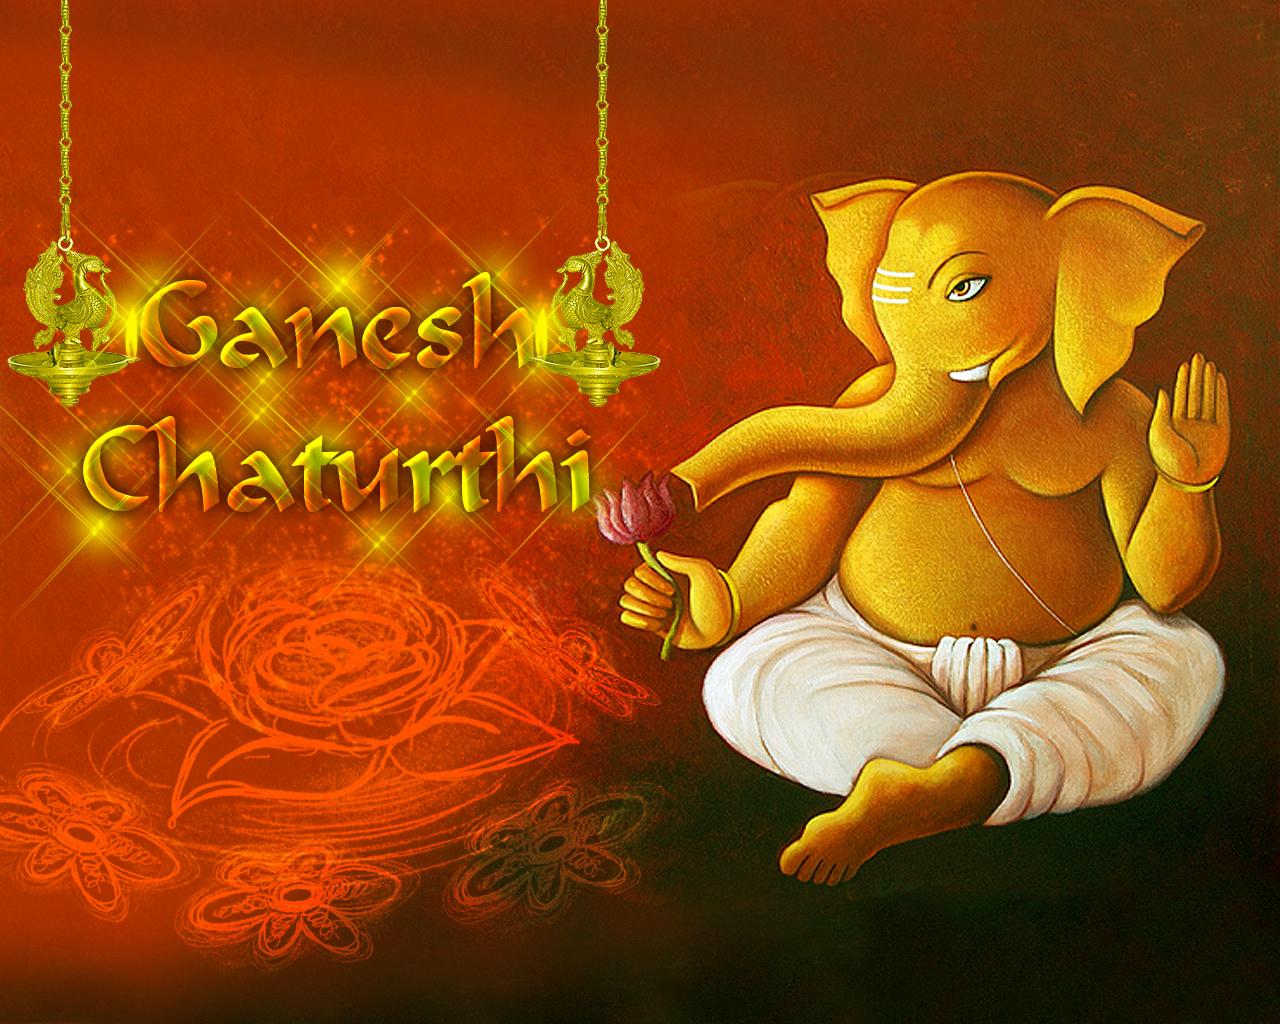 Ganesh Chaturthi HD Images & Wallpapers Free Download